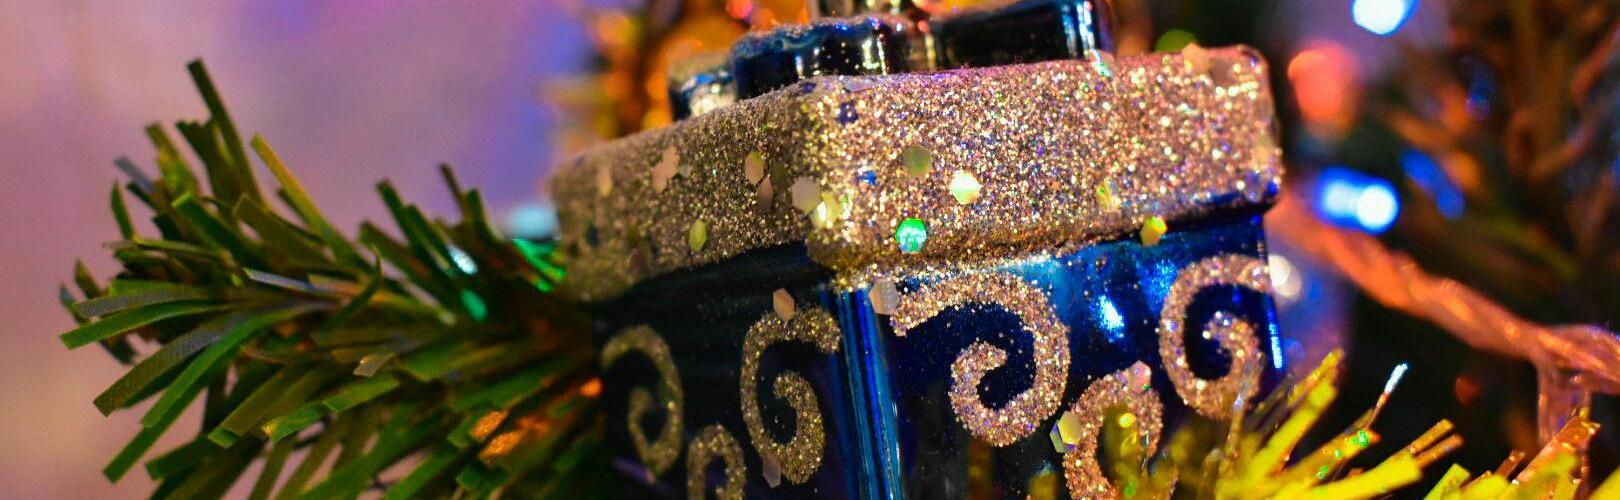 stocking stuffers for stoners marijuana gift ideas